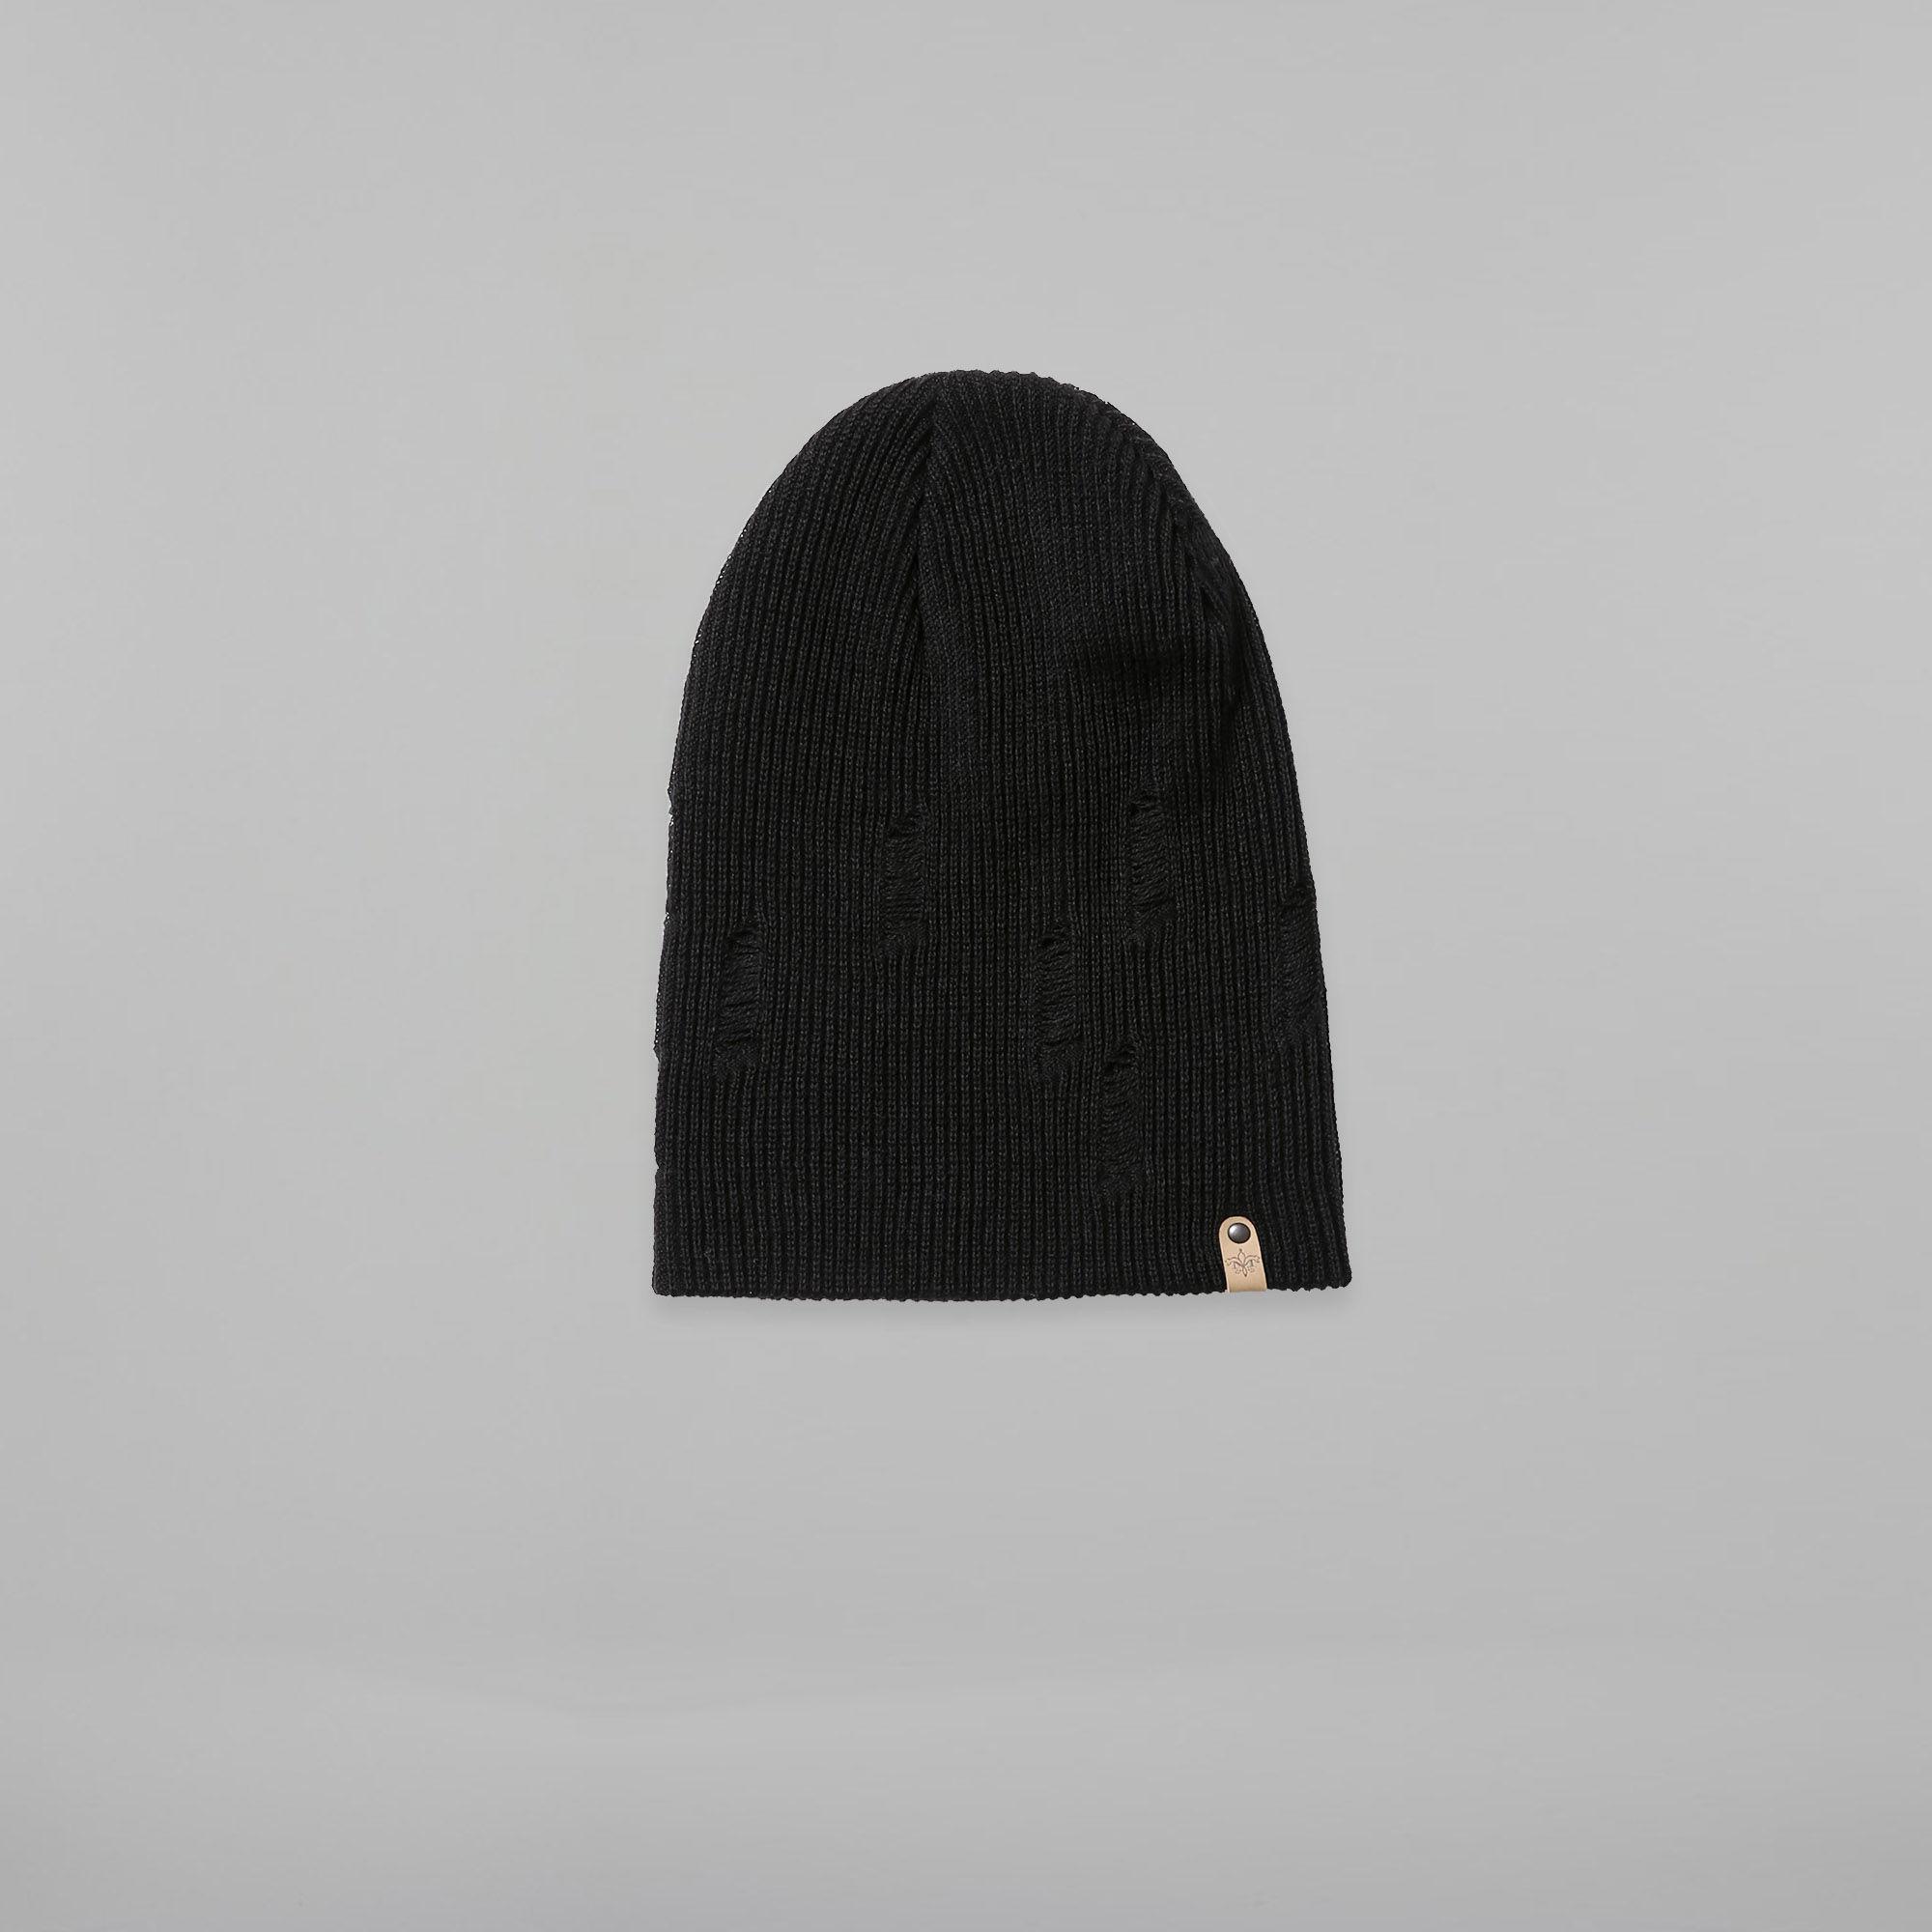 Mackage Taz Wool Beanie For Men in Black for Men - Lyst 09f2d52d7073